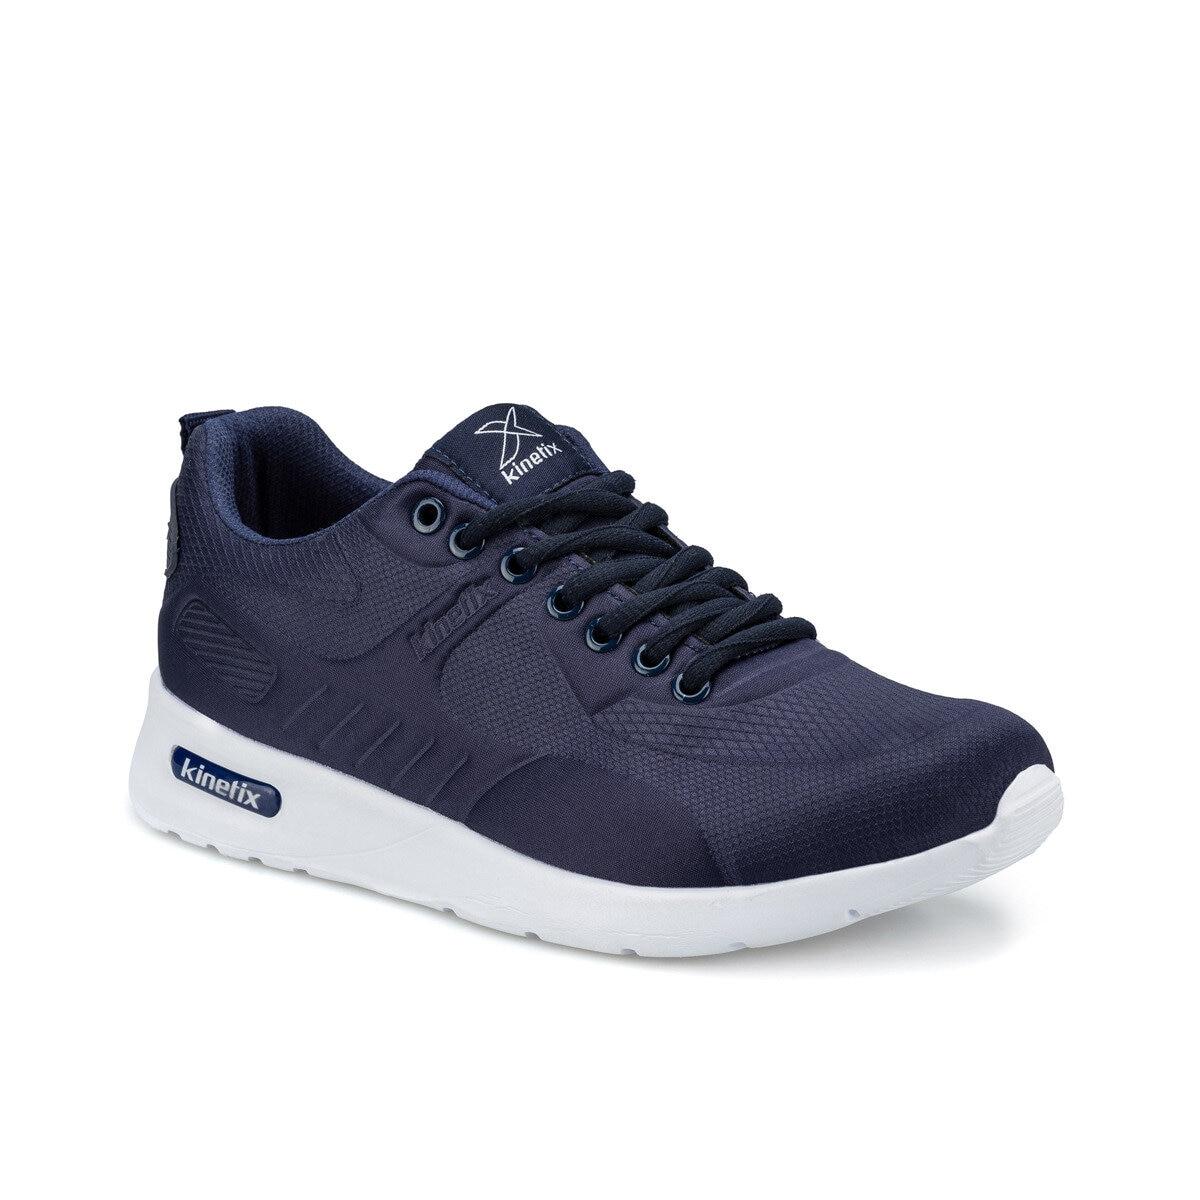 FLO Mesh Men Casual Shoes Lace-up Men Shoes Lightweight Comfortable Breathable Walking Sneakers Tenis Masculino Zapatillas Hombre Male Sneaker Sport Durable Fashion Мужские кроссовки Shoes NINA MESH M KINETIX